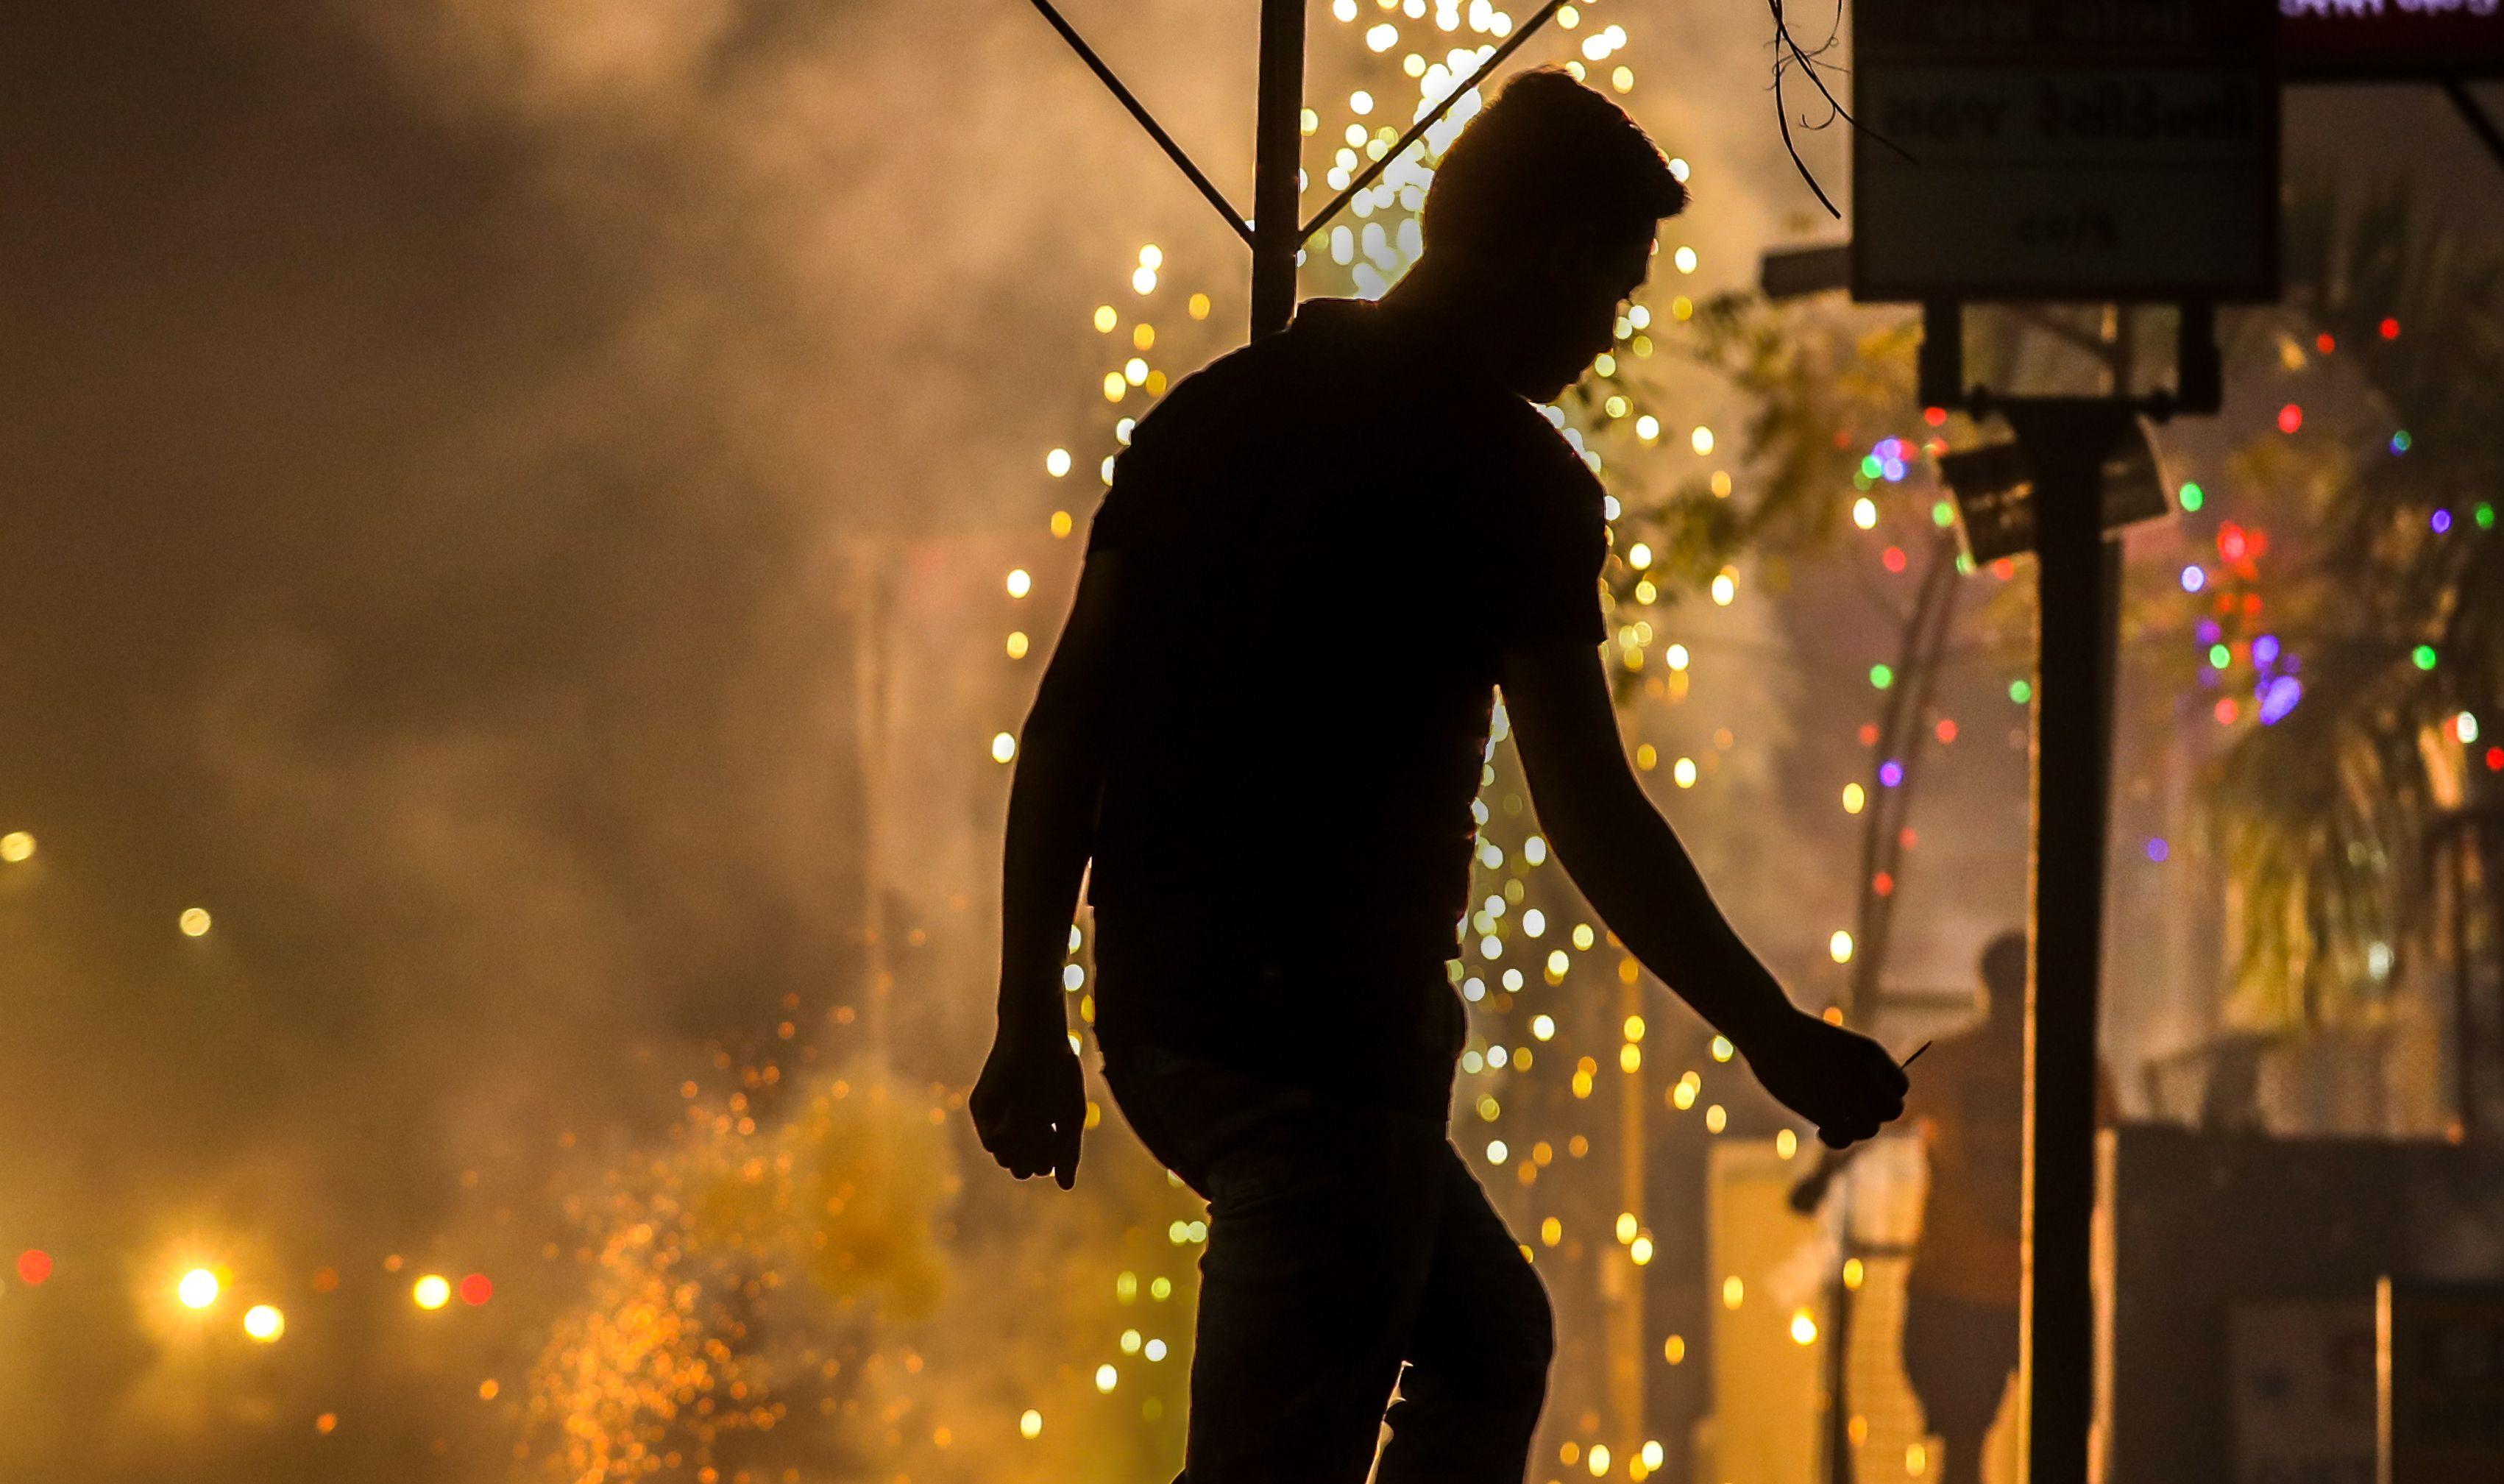 Diwali festival in Ahmedabad, India - 07 Nov 2018